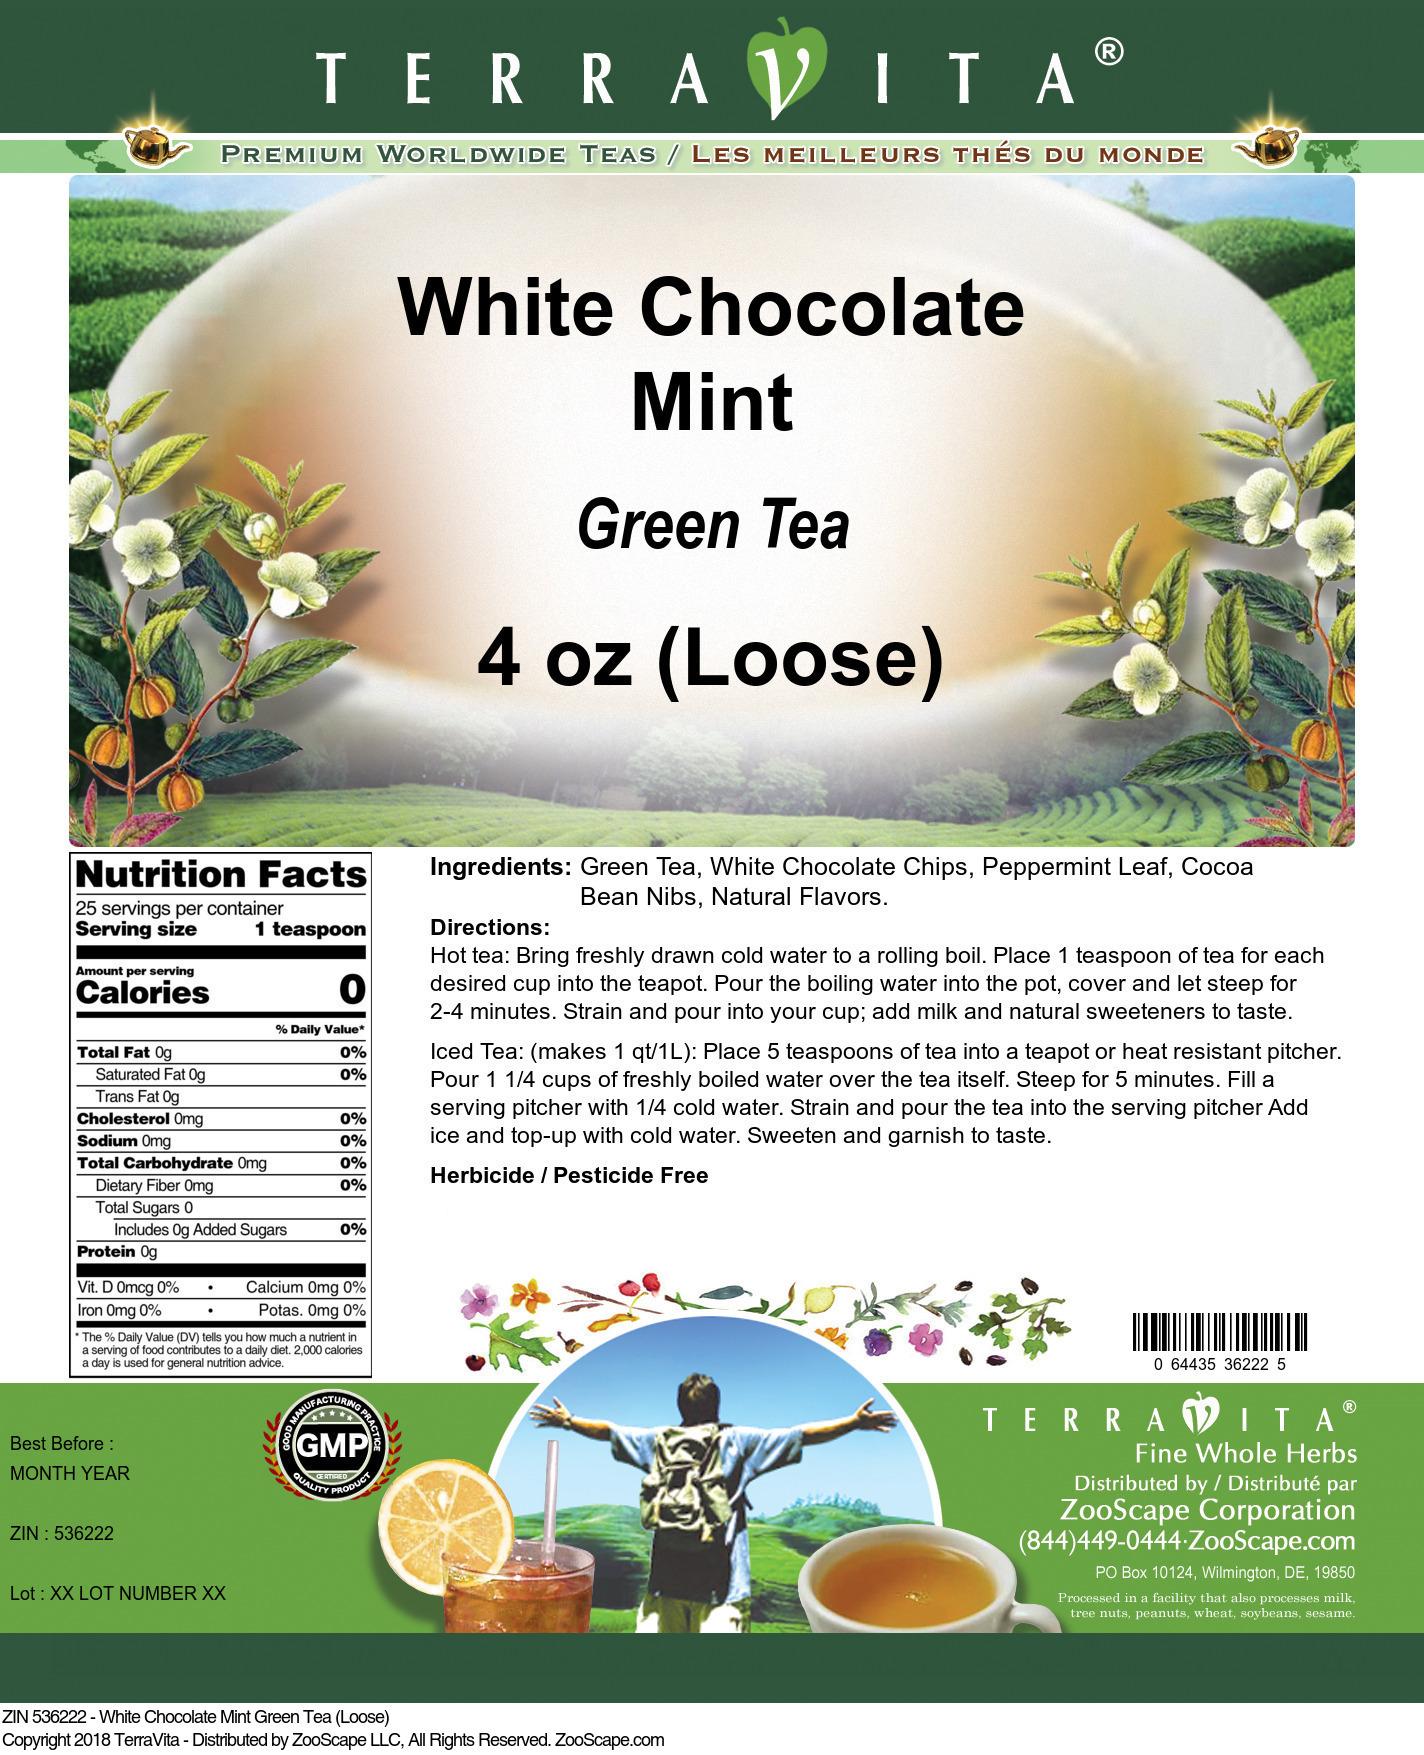 White Chocolate Mint Green Tea